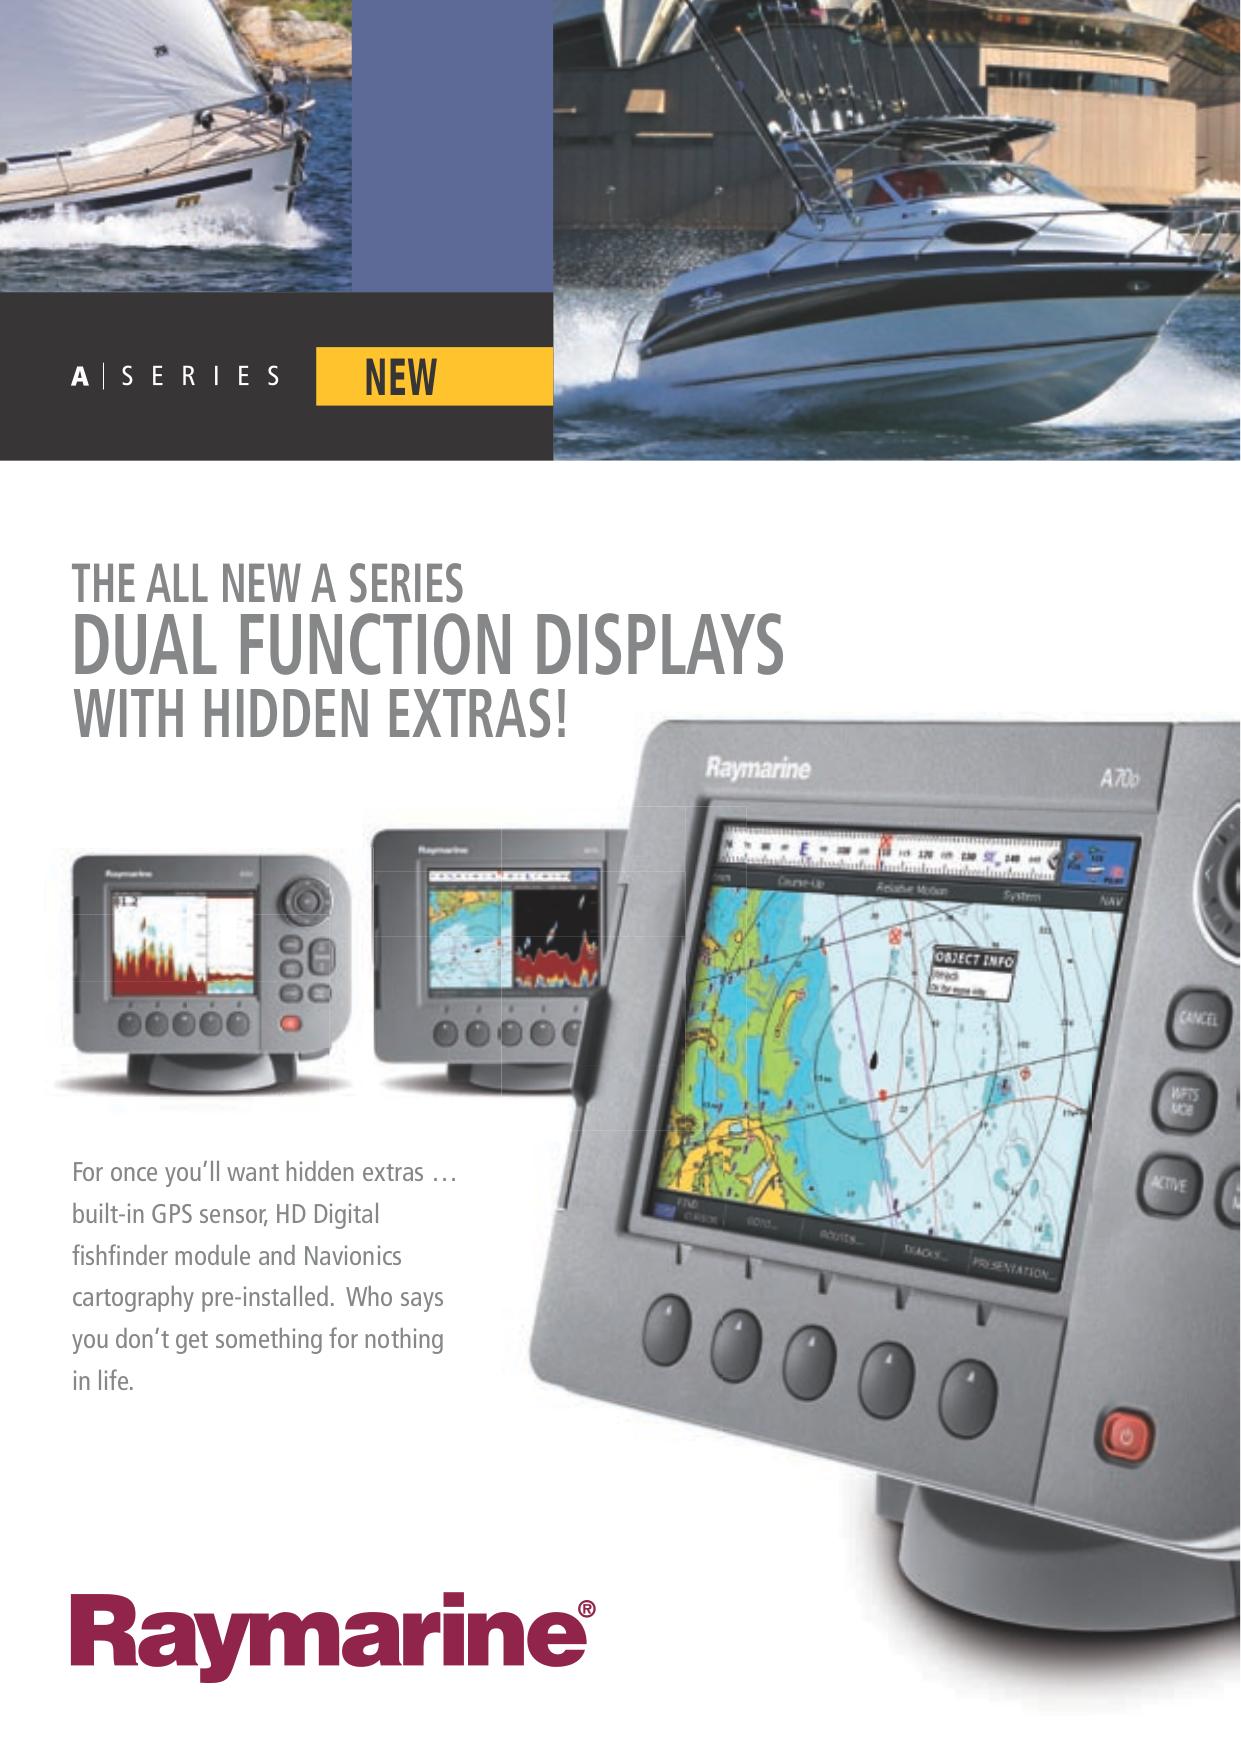 raymarine e series hybridtouch manual